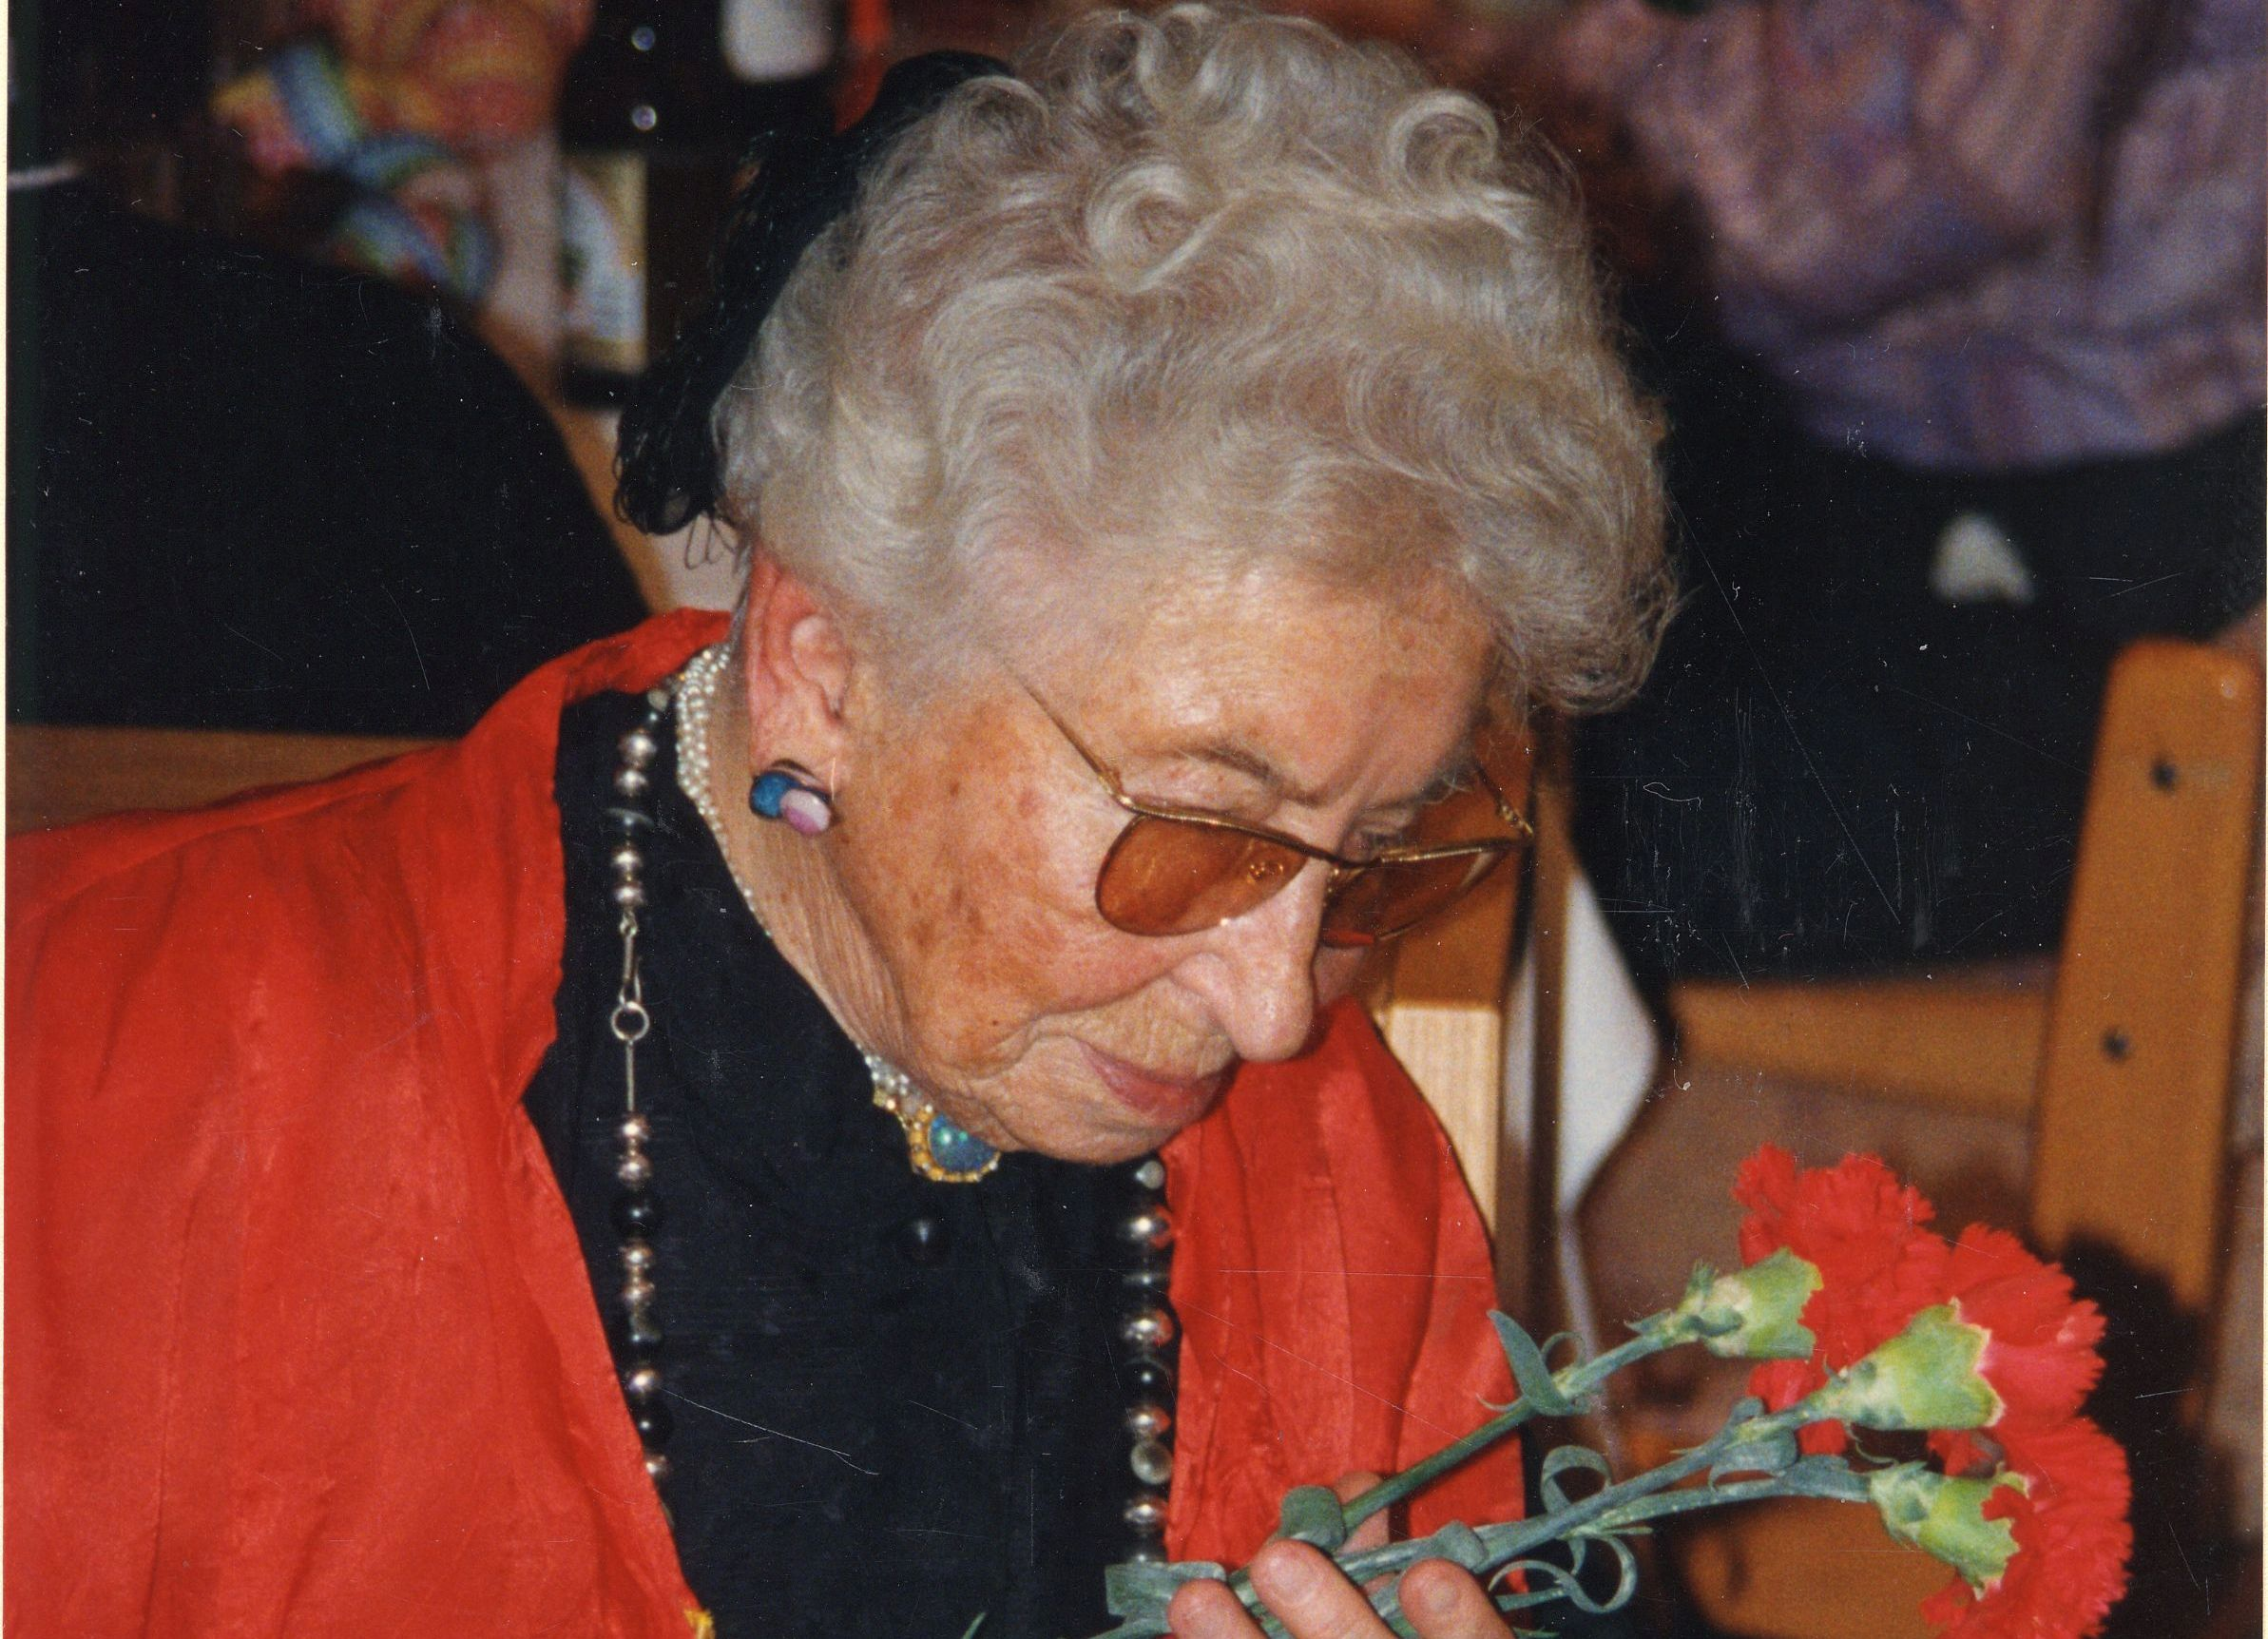 Alles Gute zum 120. Geburtstag May Hofer!